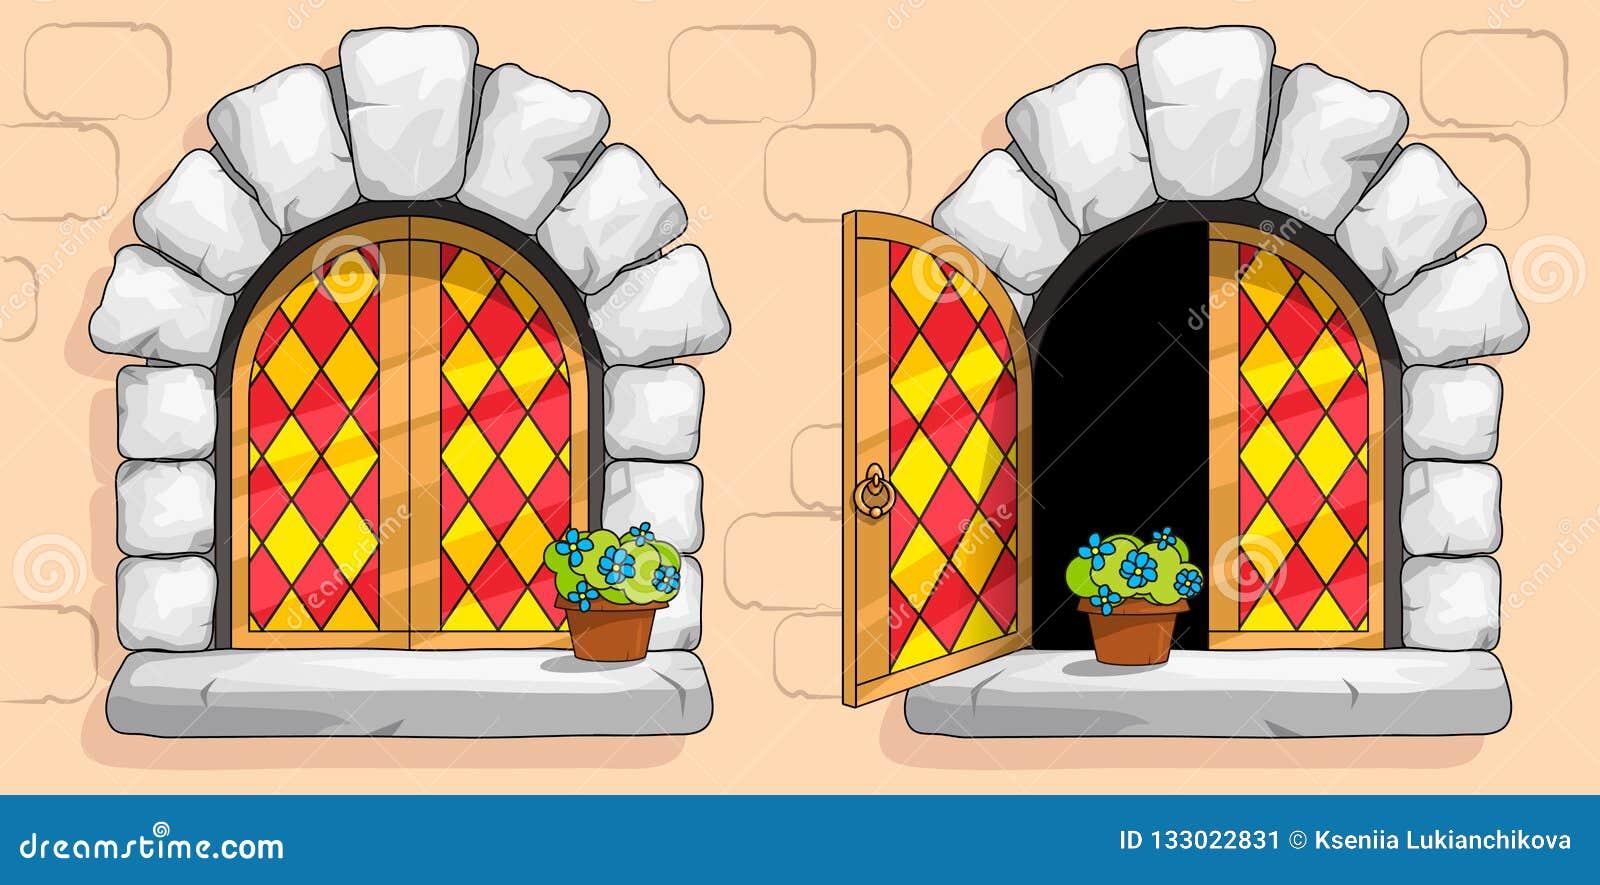 Ventana medieval, vitrales rojos, piedras blancas